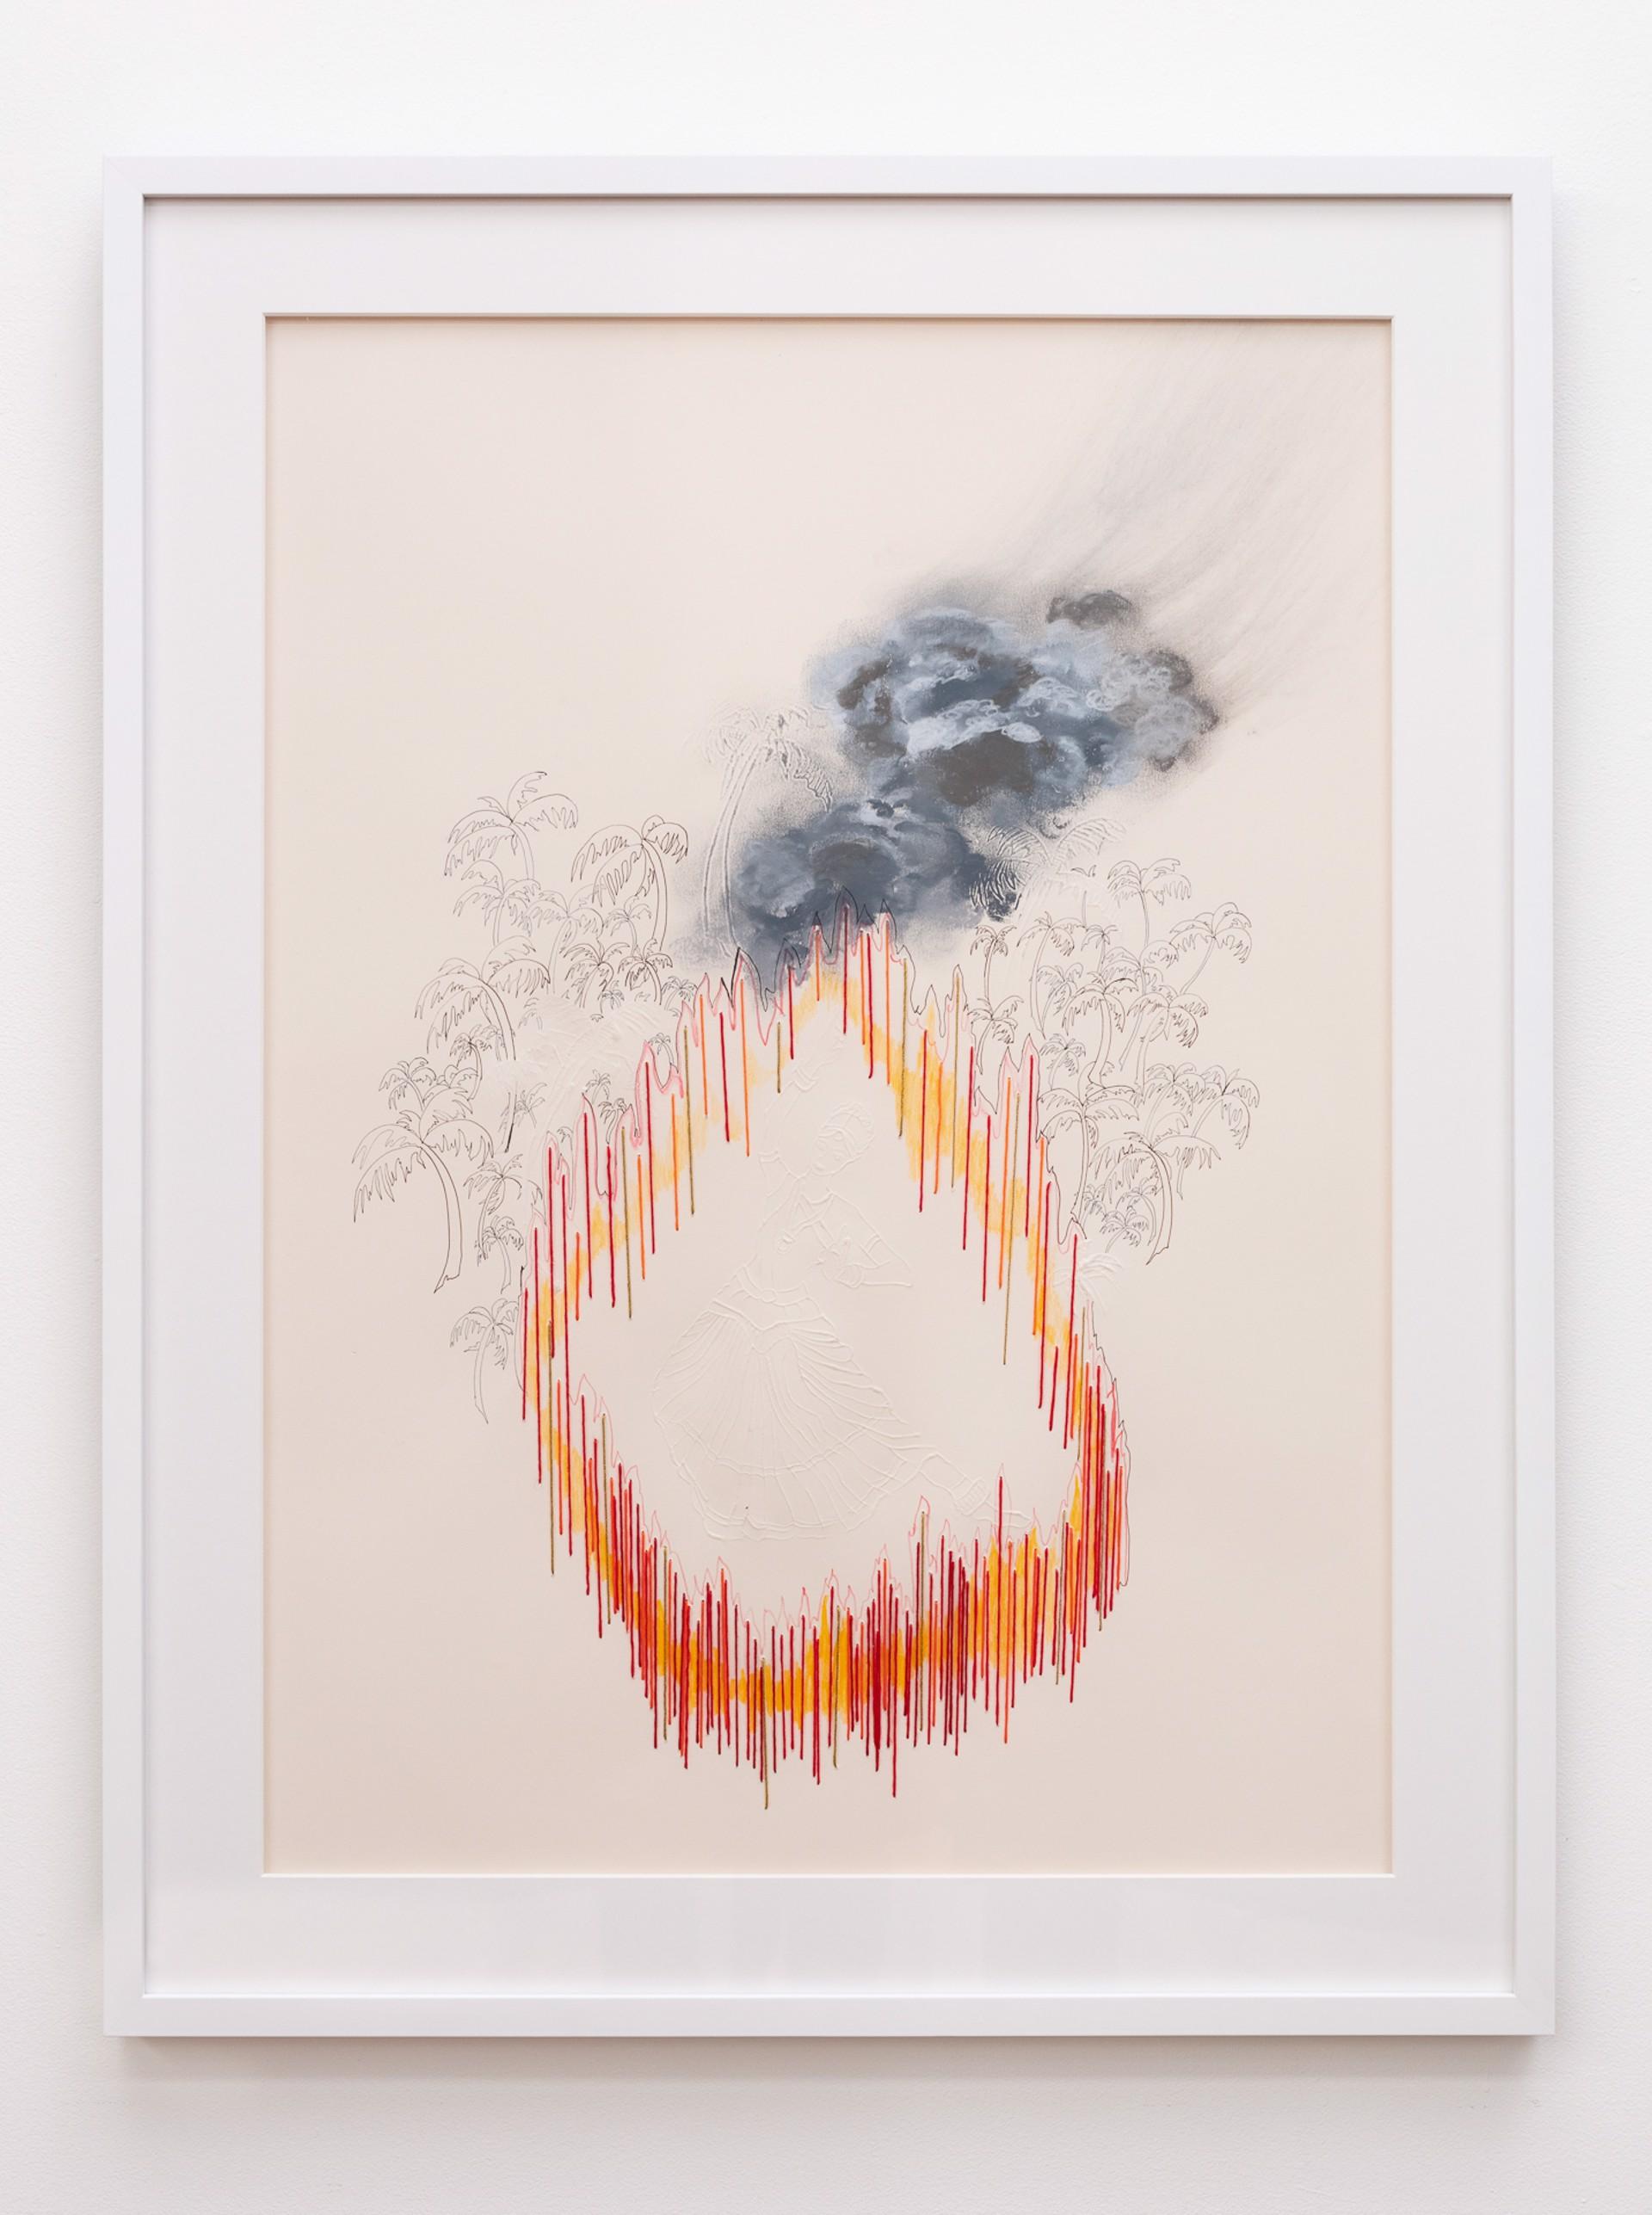 Ring of Fire by Suchitra Mattai